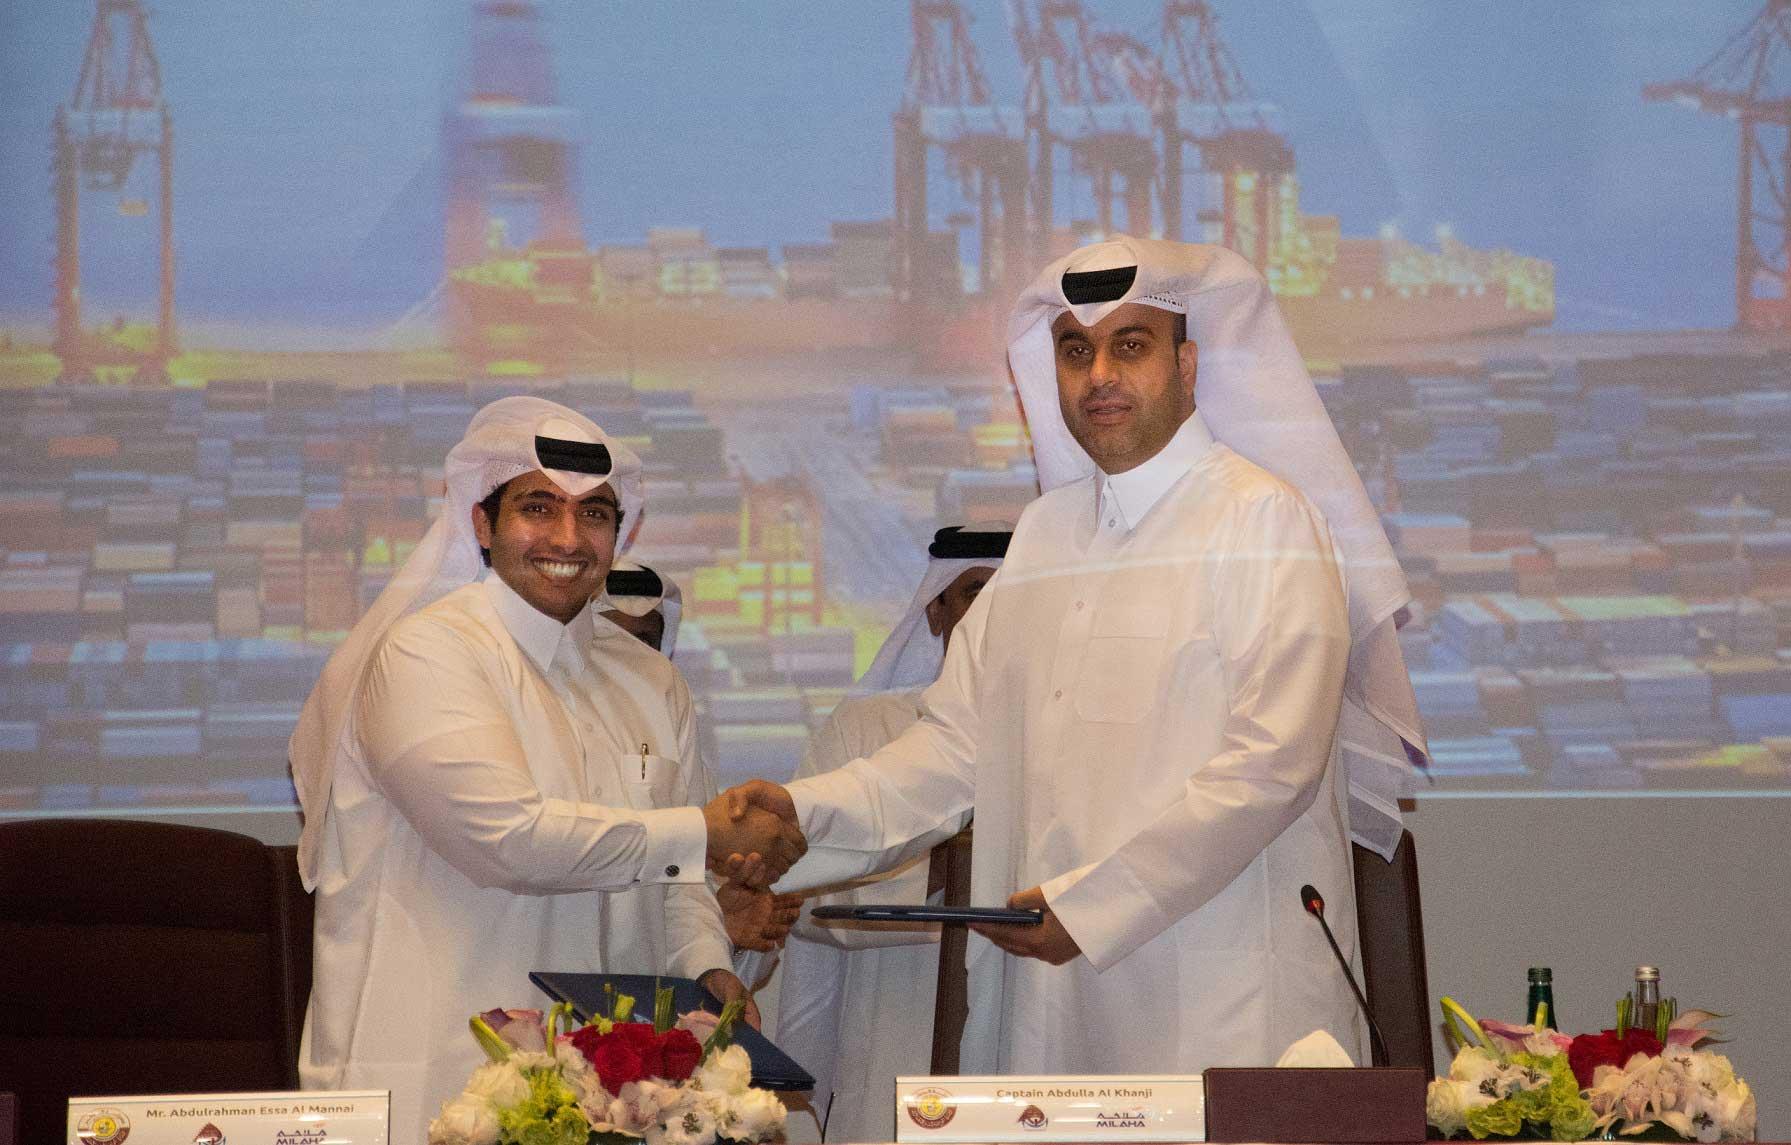 Mwani Qatar and Mihala agree to manage Hamad Port